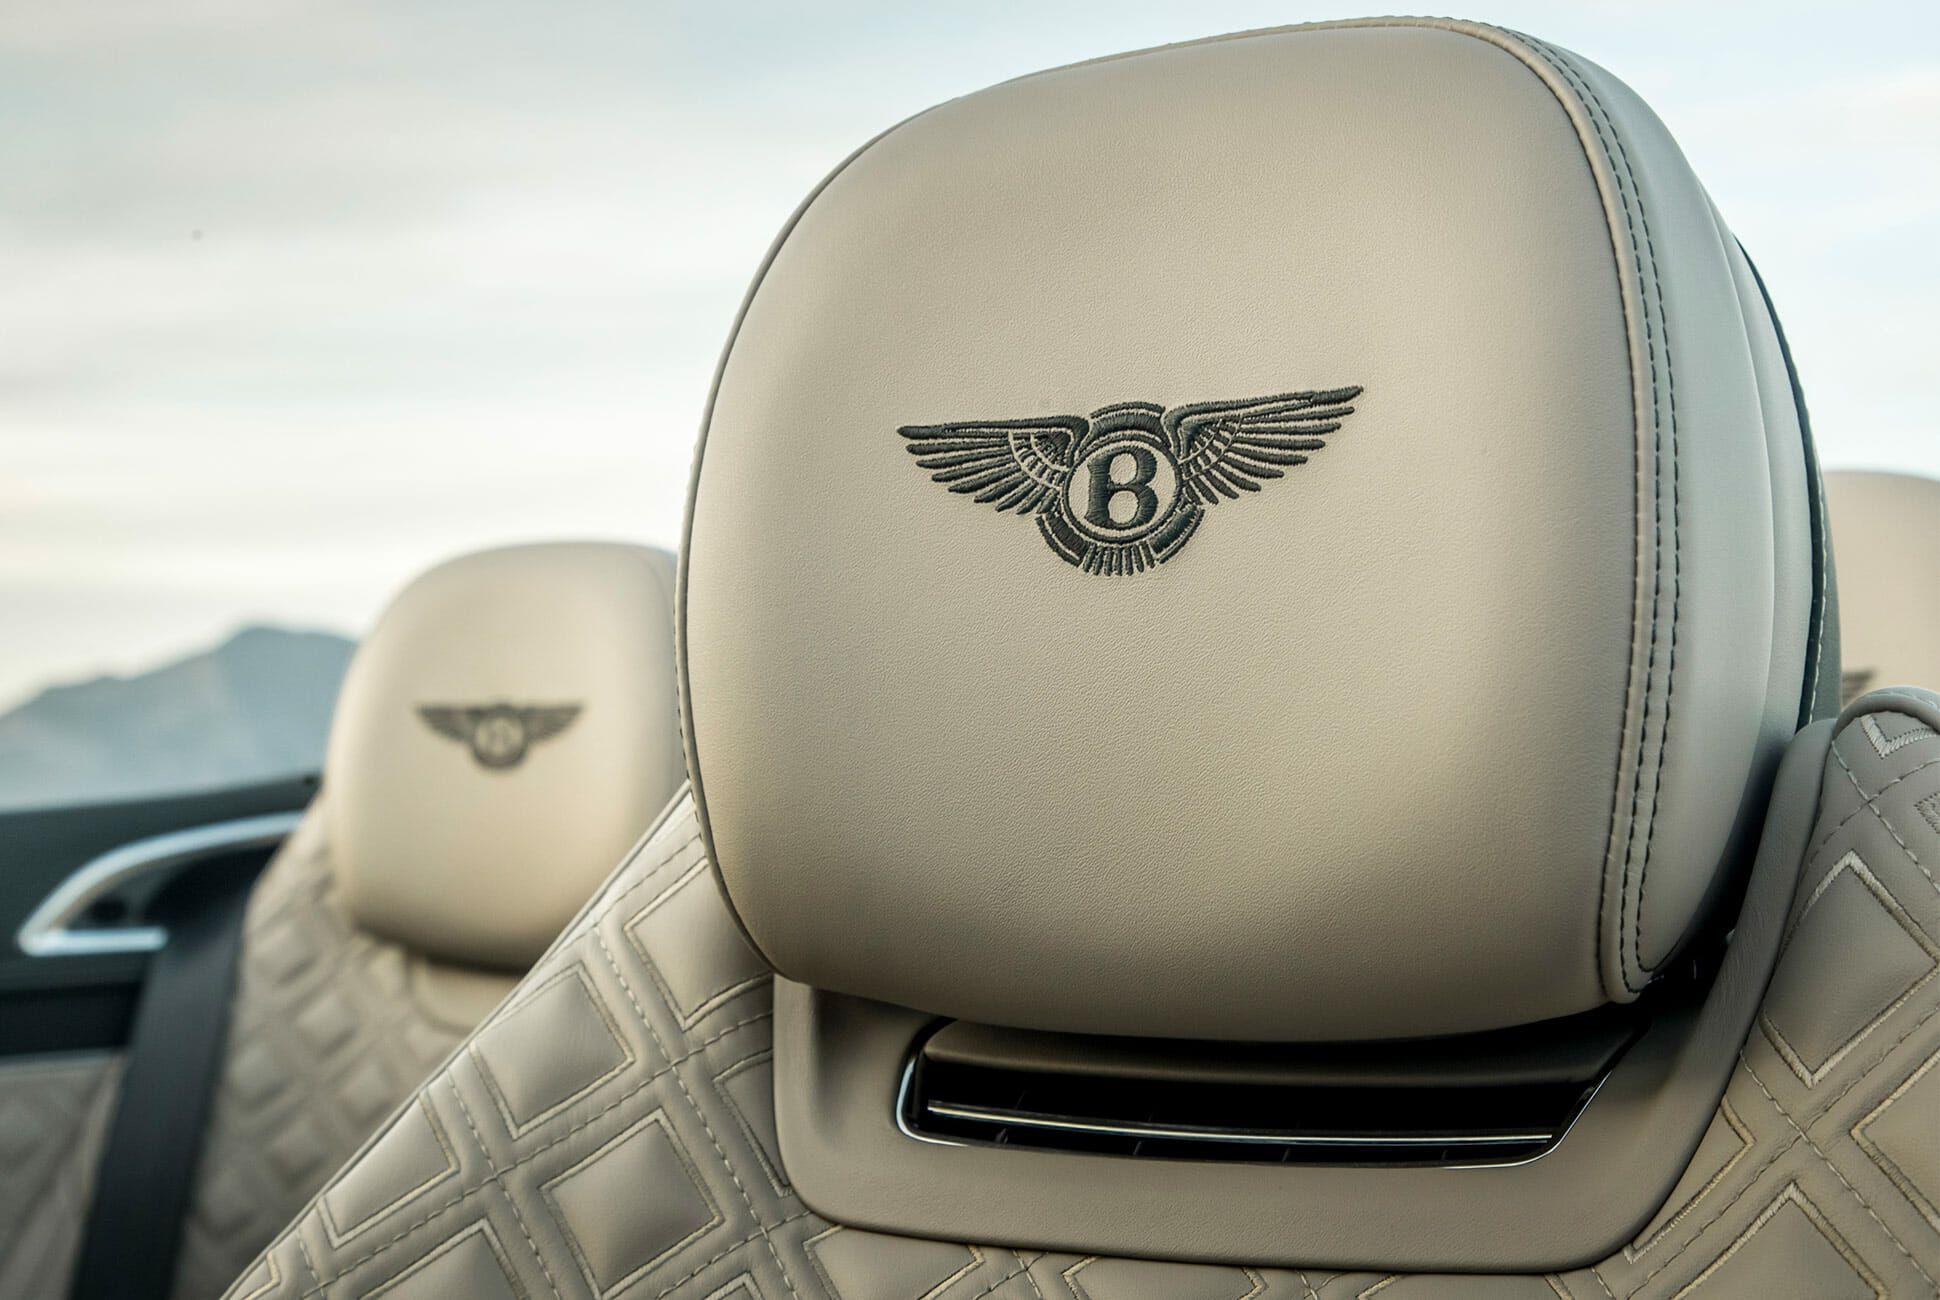 Bentley-Continental-GTC-Review-gear-patrol-slide-11